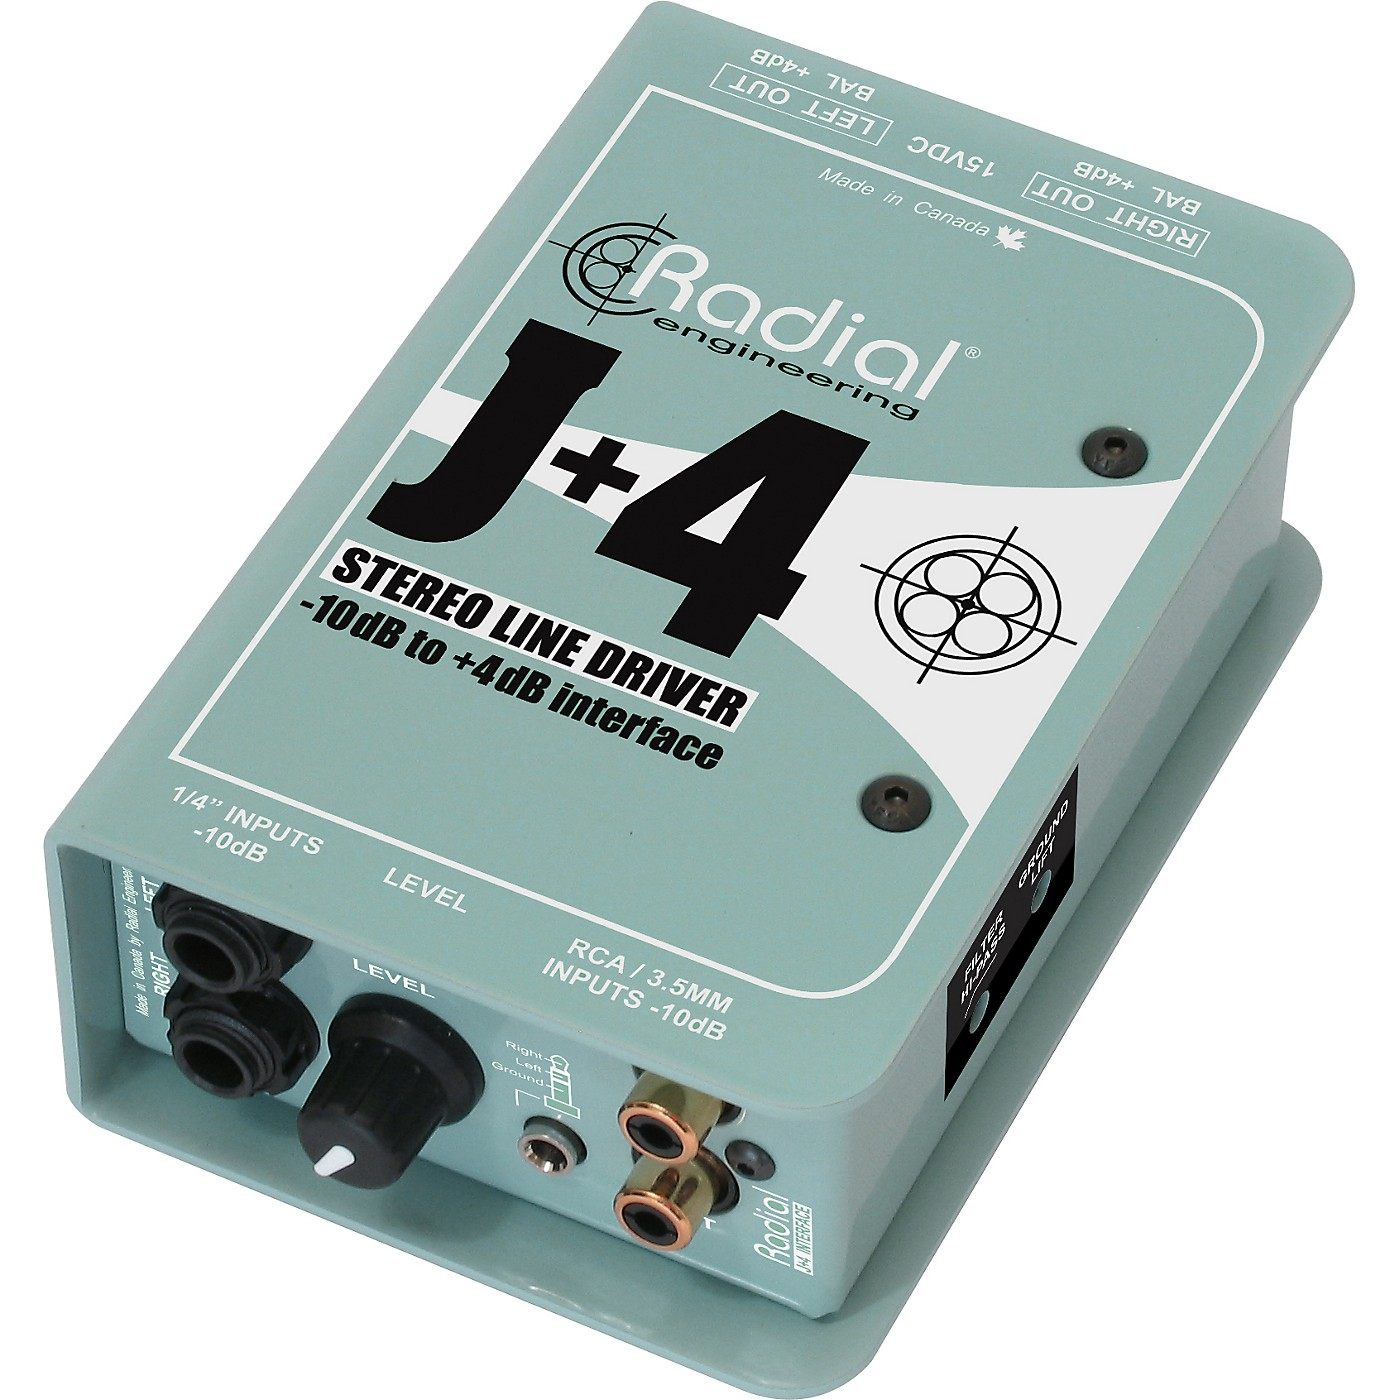 Radial Engineering J+4 Stereo Line Driver -10dB to +4dB Interface thumbnail